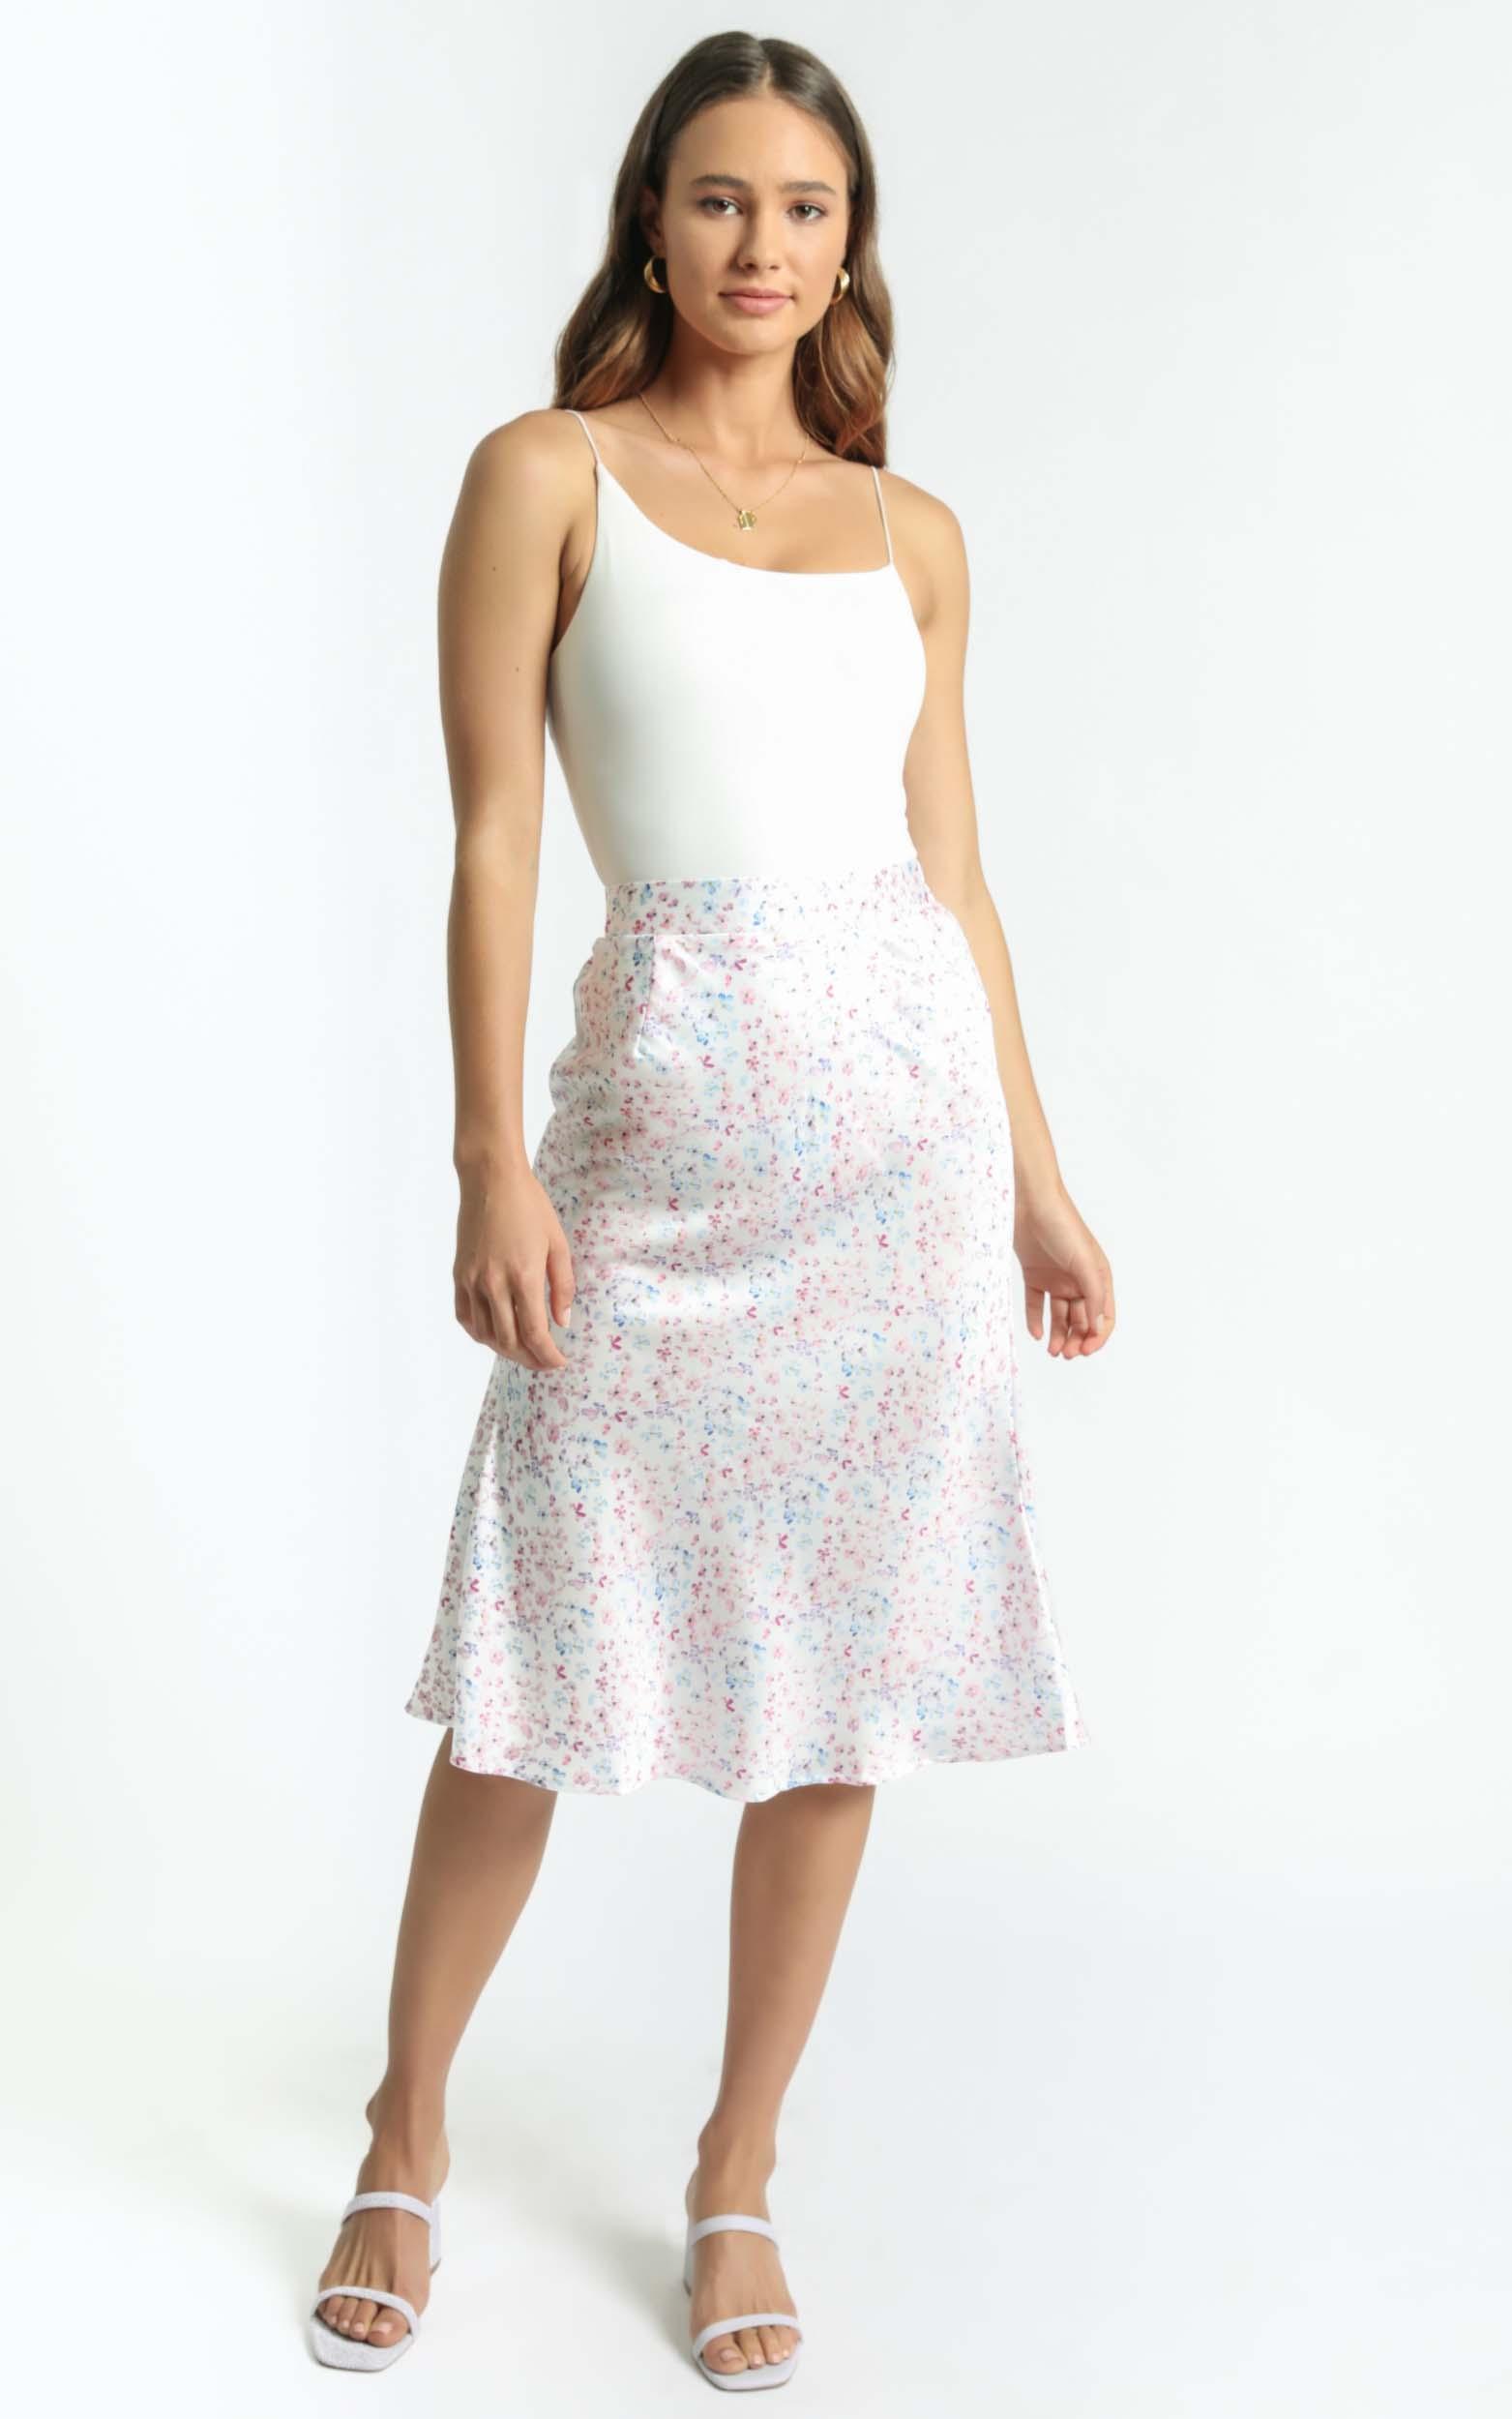 Riya Skirt in White Floral - 6 (XS), White, hi-res image number null